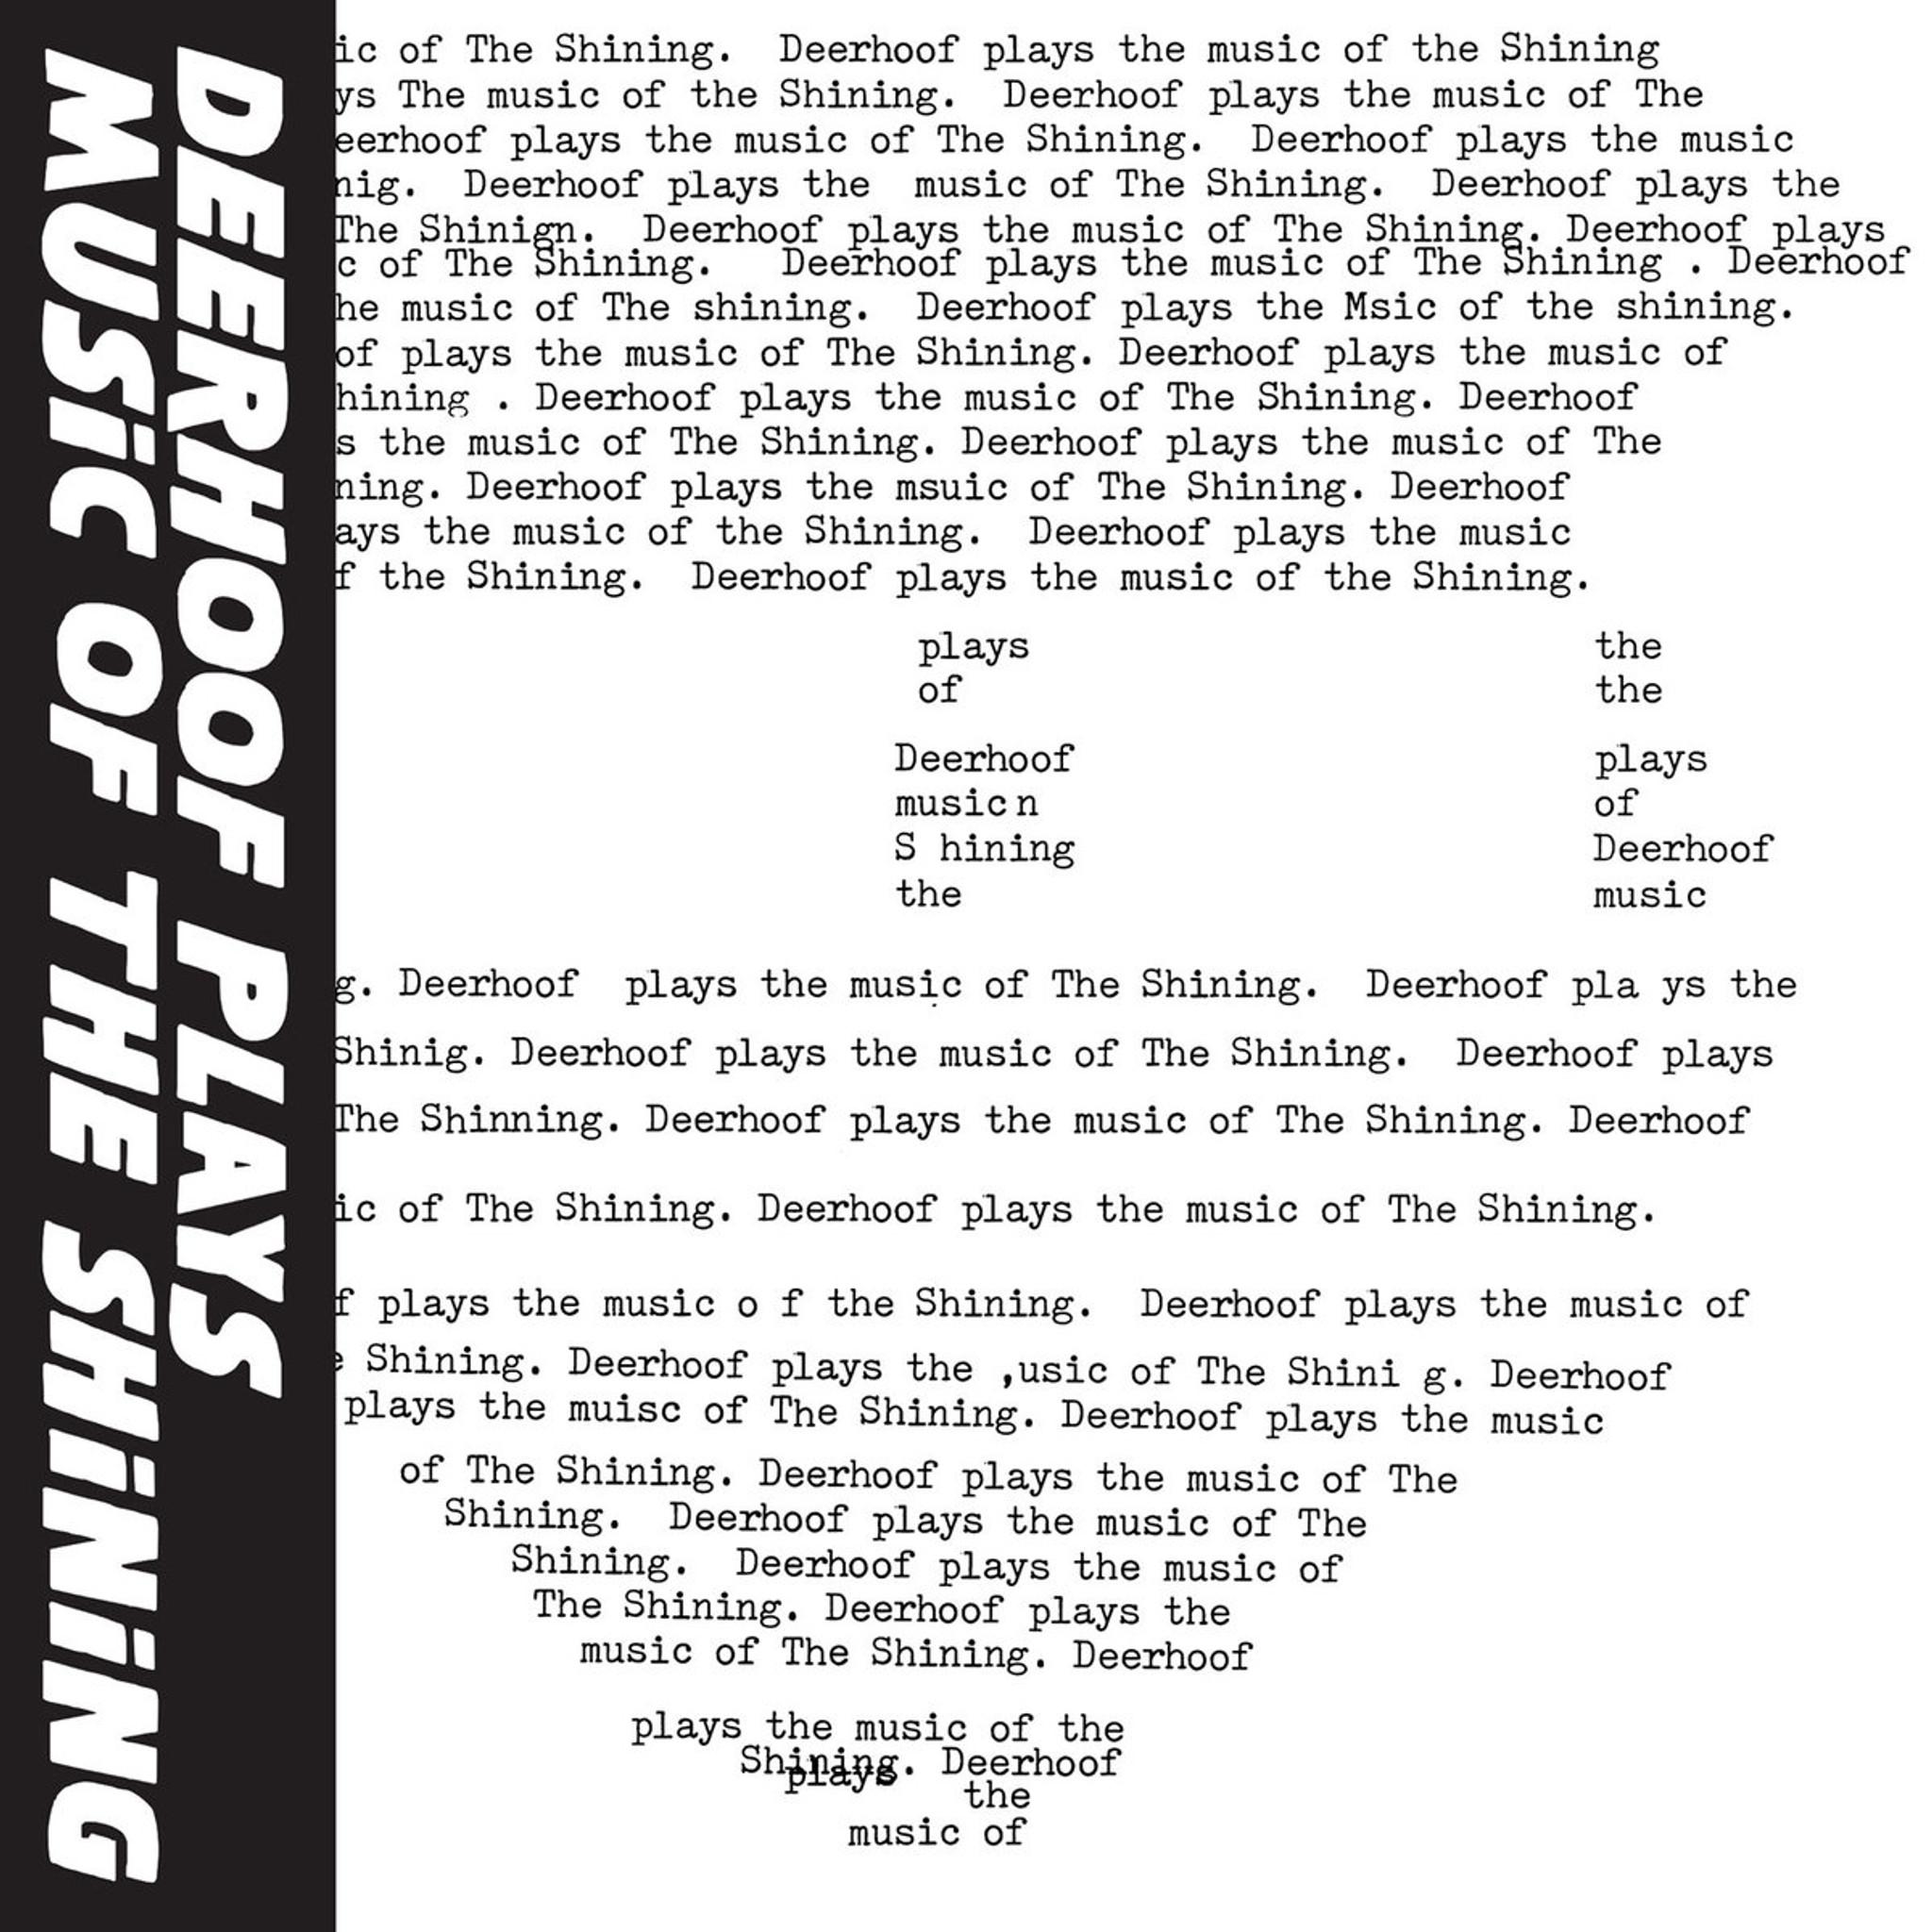 2b1059c9653e DEERHOOF  Plays The Music Of The Shining 7